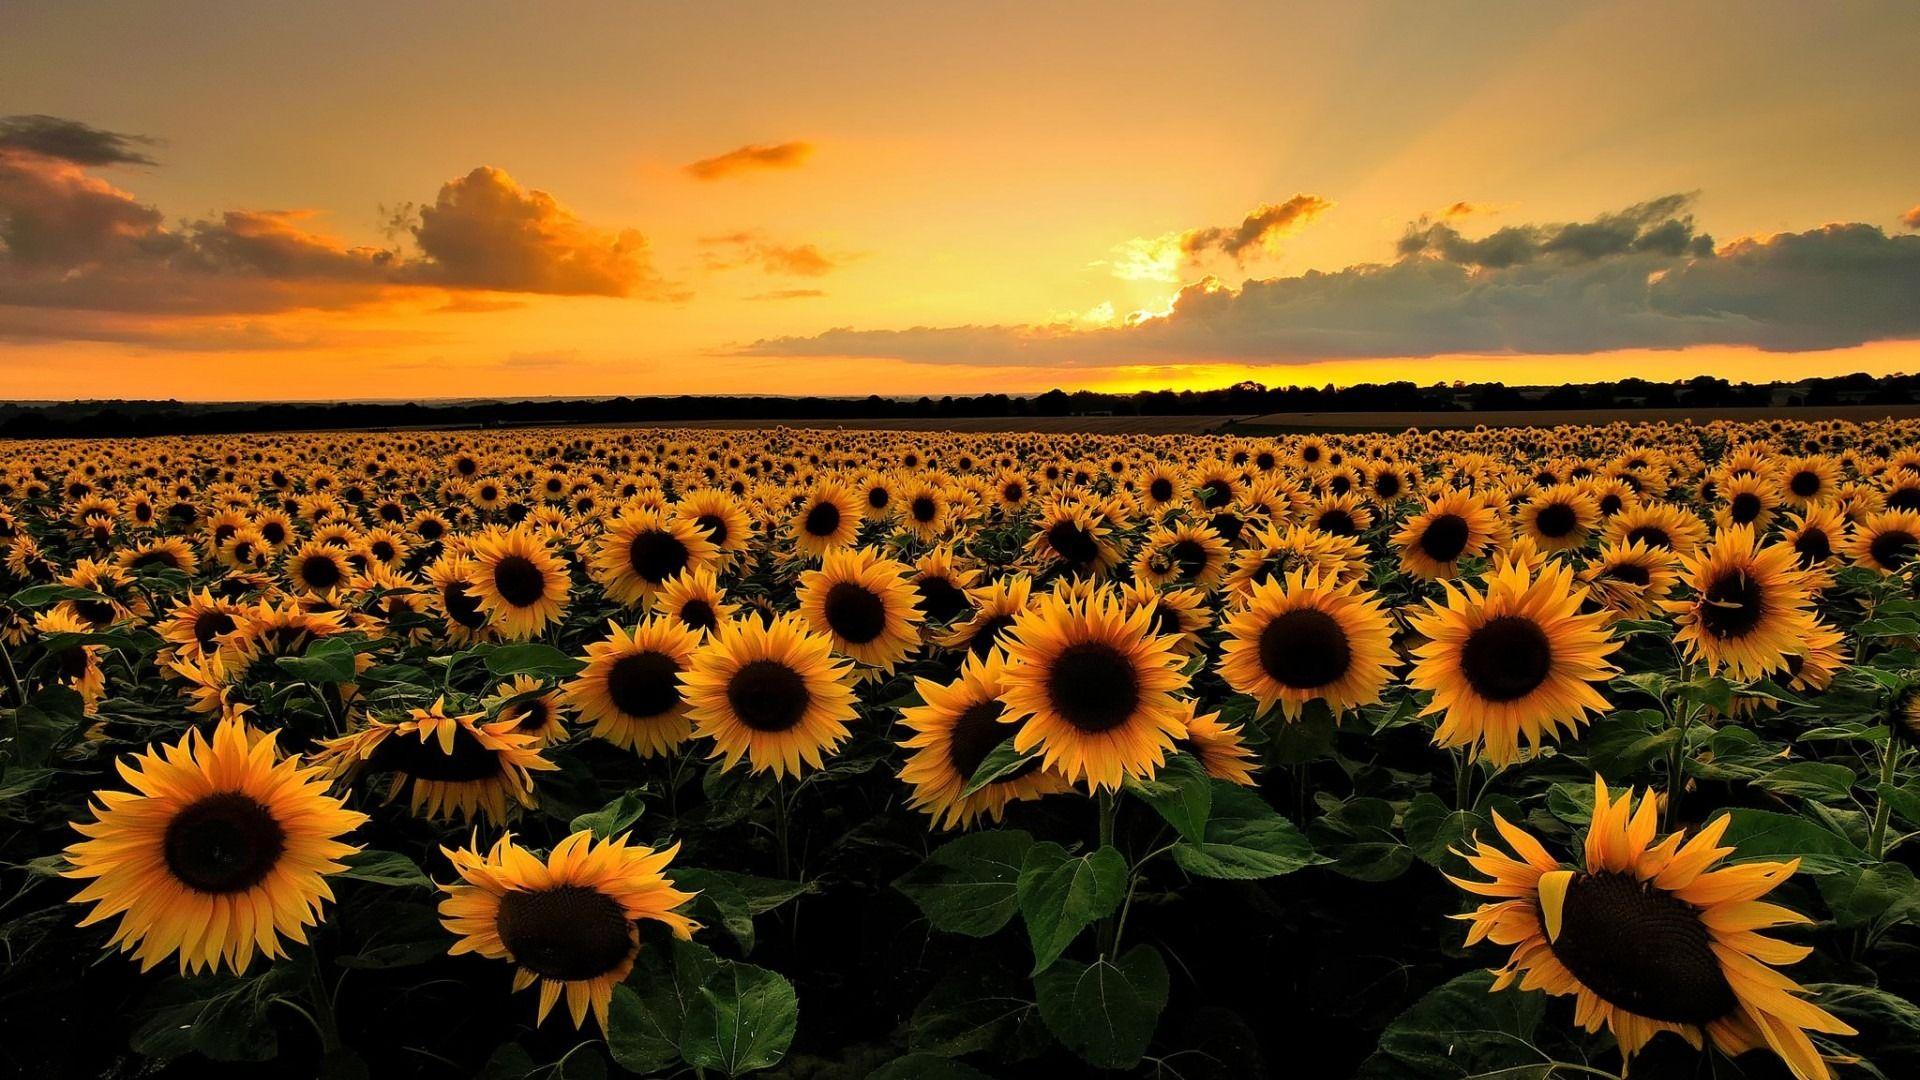 desktop backgrounds sunflowers Download - Lovely Sunflowers ...